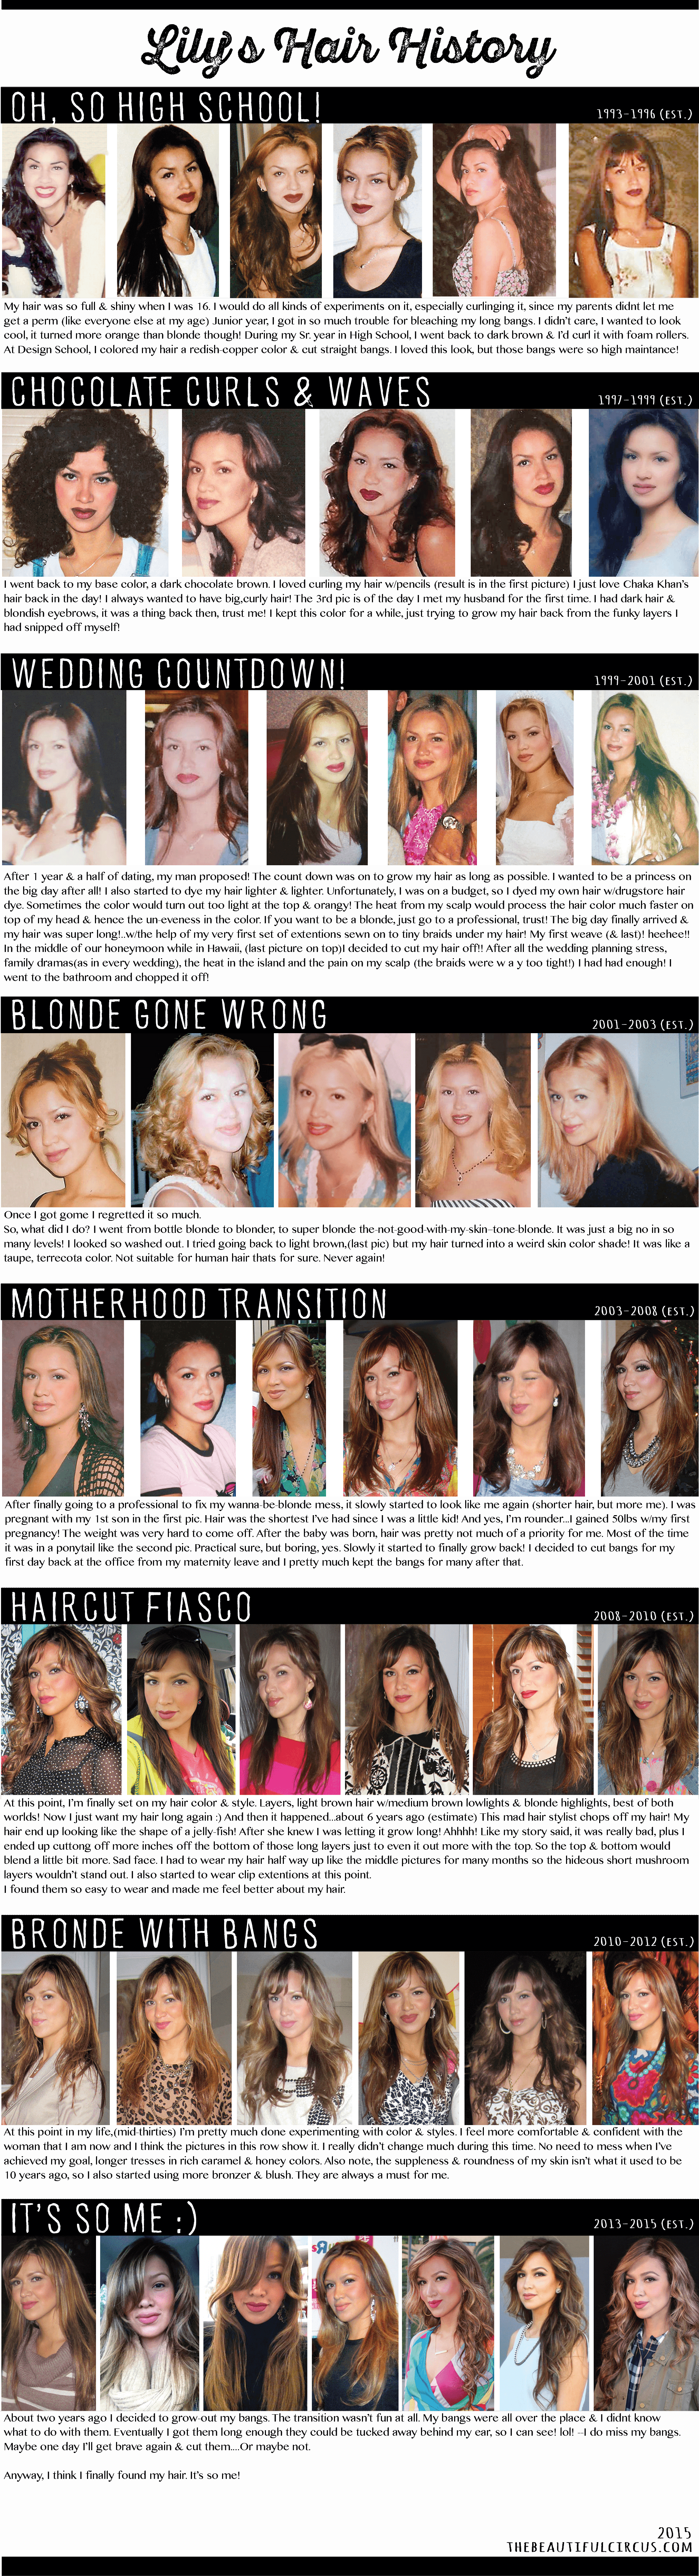 lilylove213 Hair History